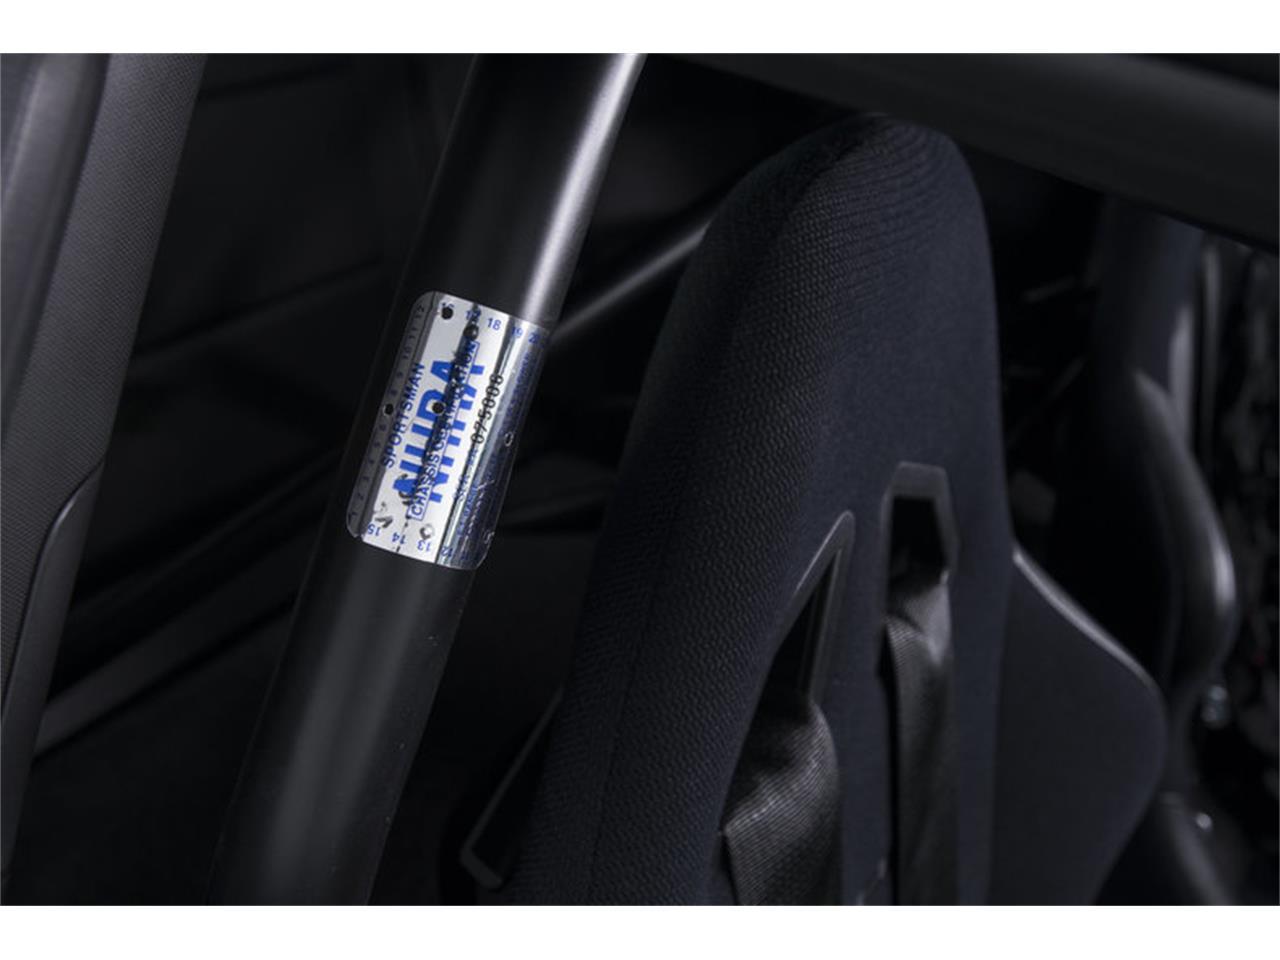 Large Picture of '16 Chevrolet Camaro COPO - $139,900.00 - MFAR